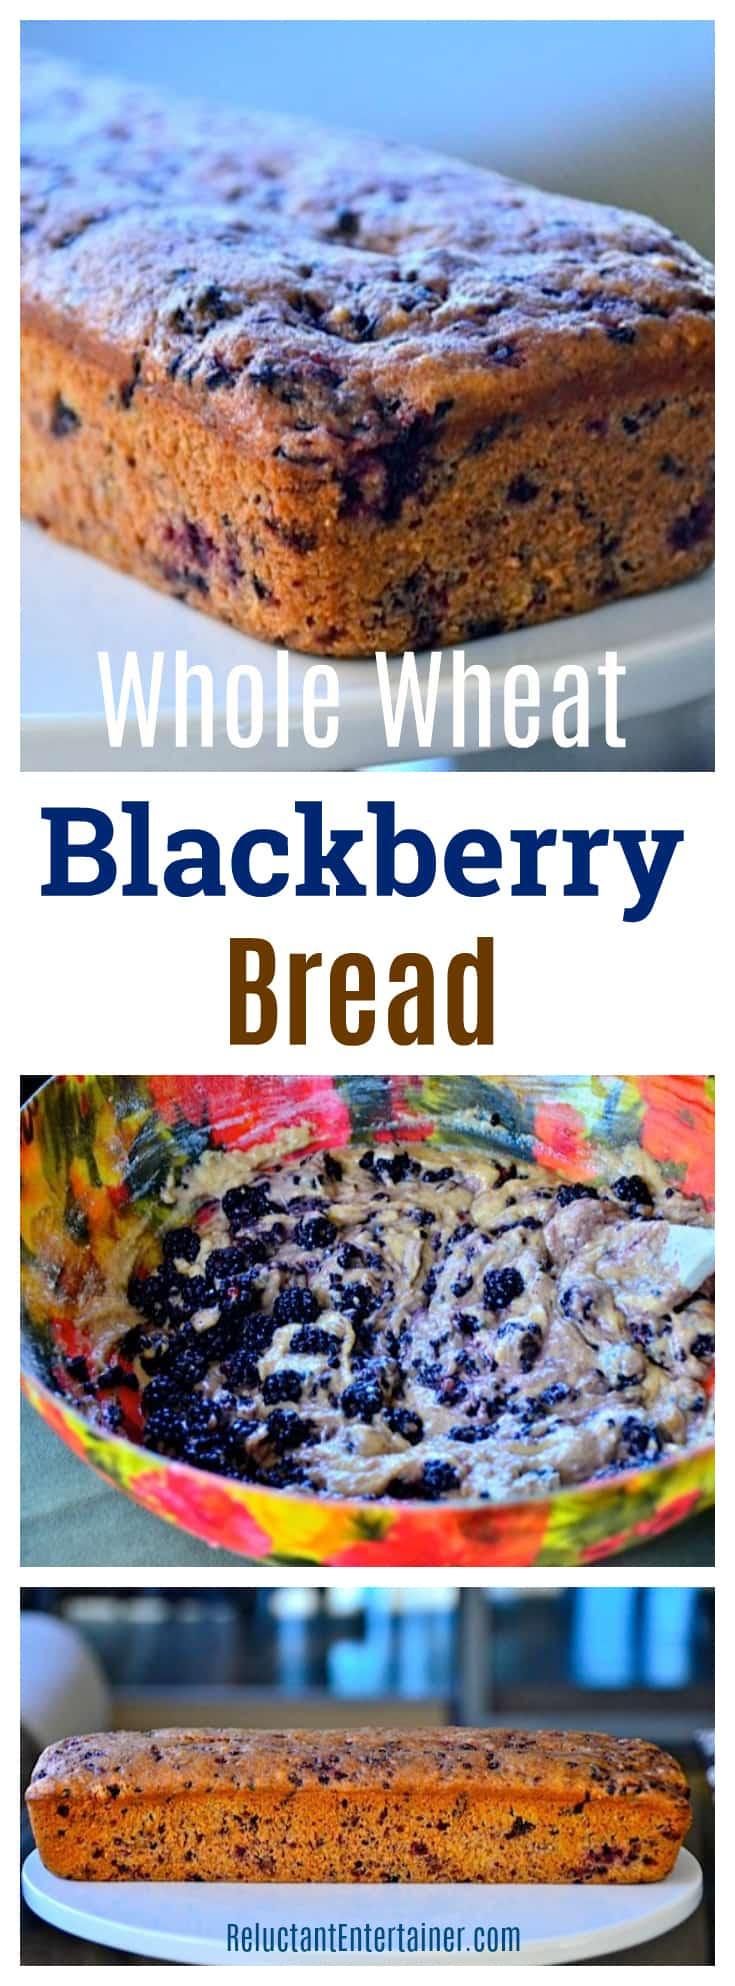 Green Valley Organic Whole Wheat Blackberry Bread Recipe